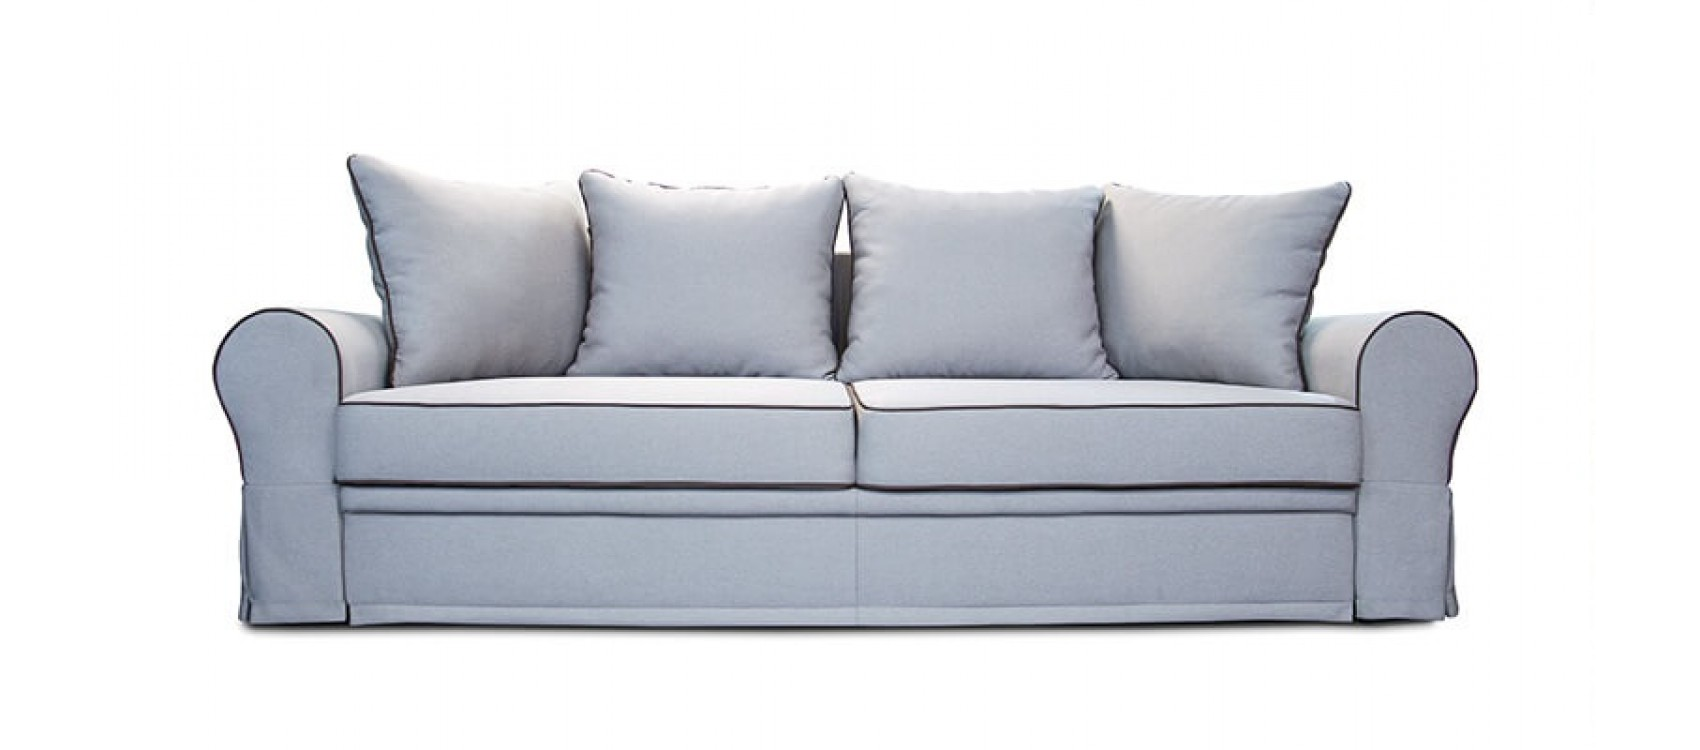 Sofa ALICE фото 13